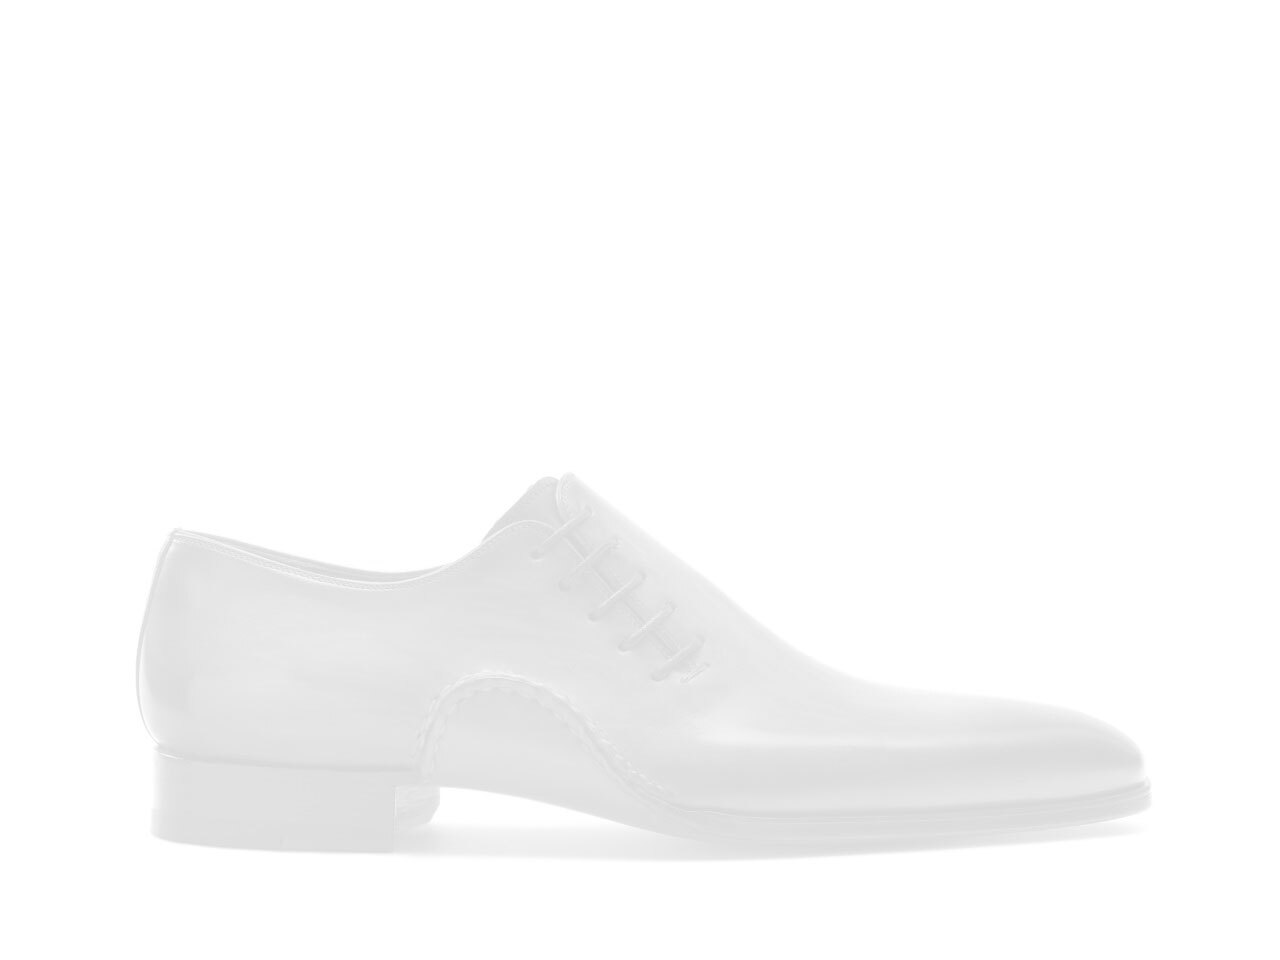 Sole of the Magnanni Echo Lo II Grey Men's Sneakers